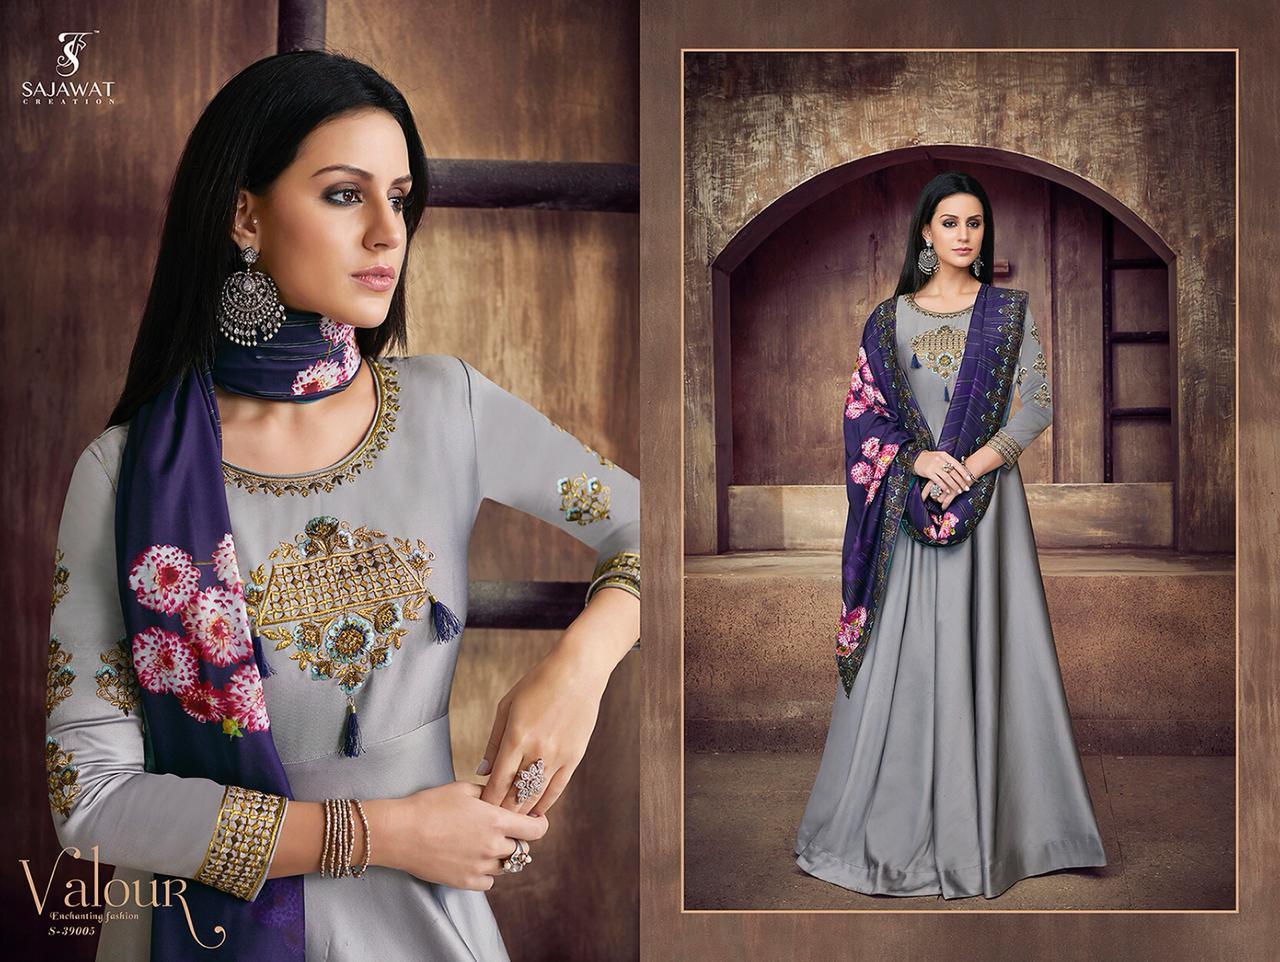 sajawat-bride-design-no-39005